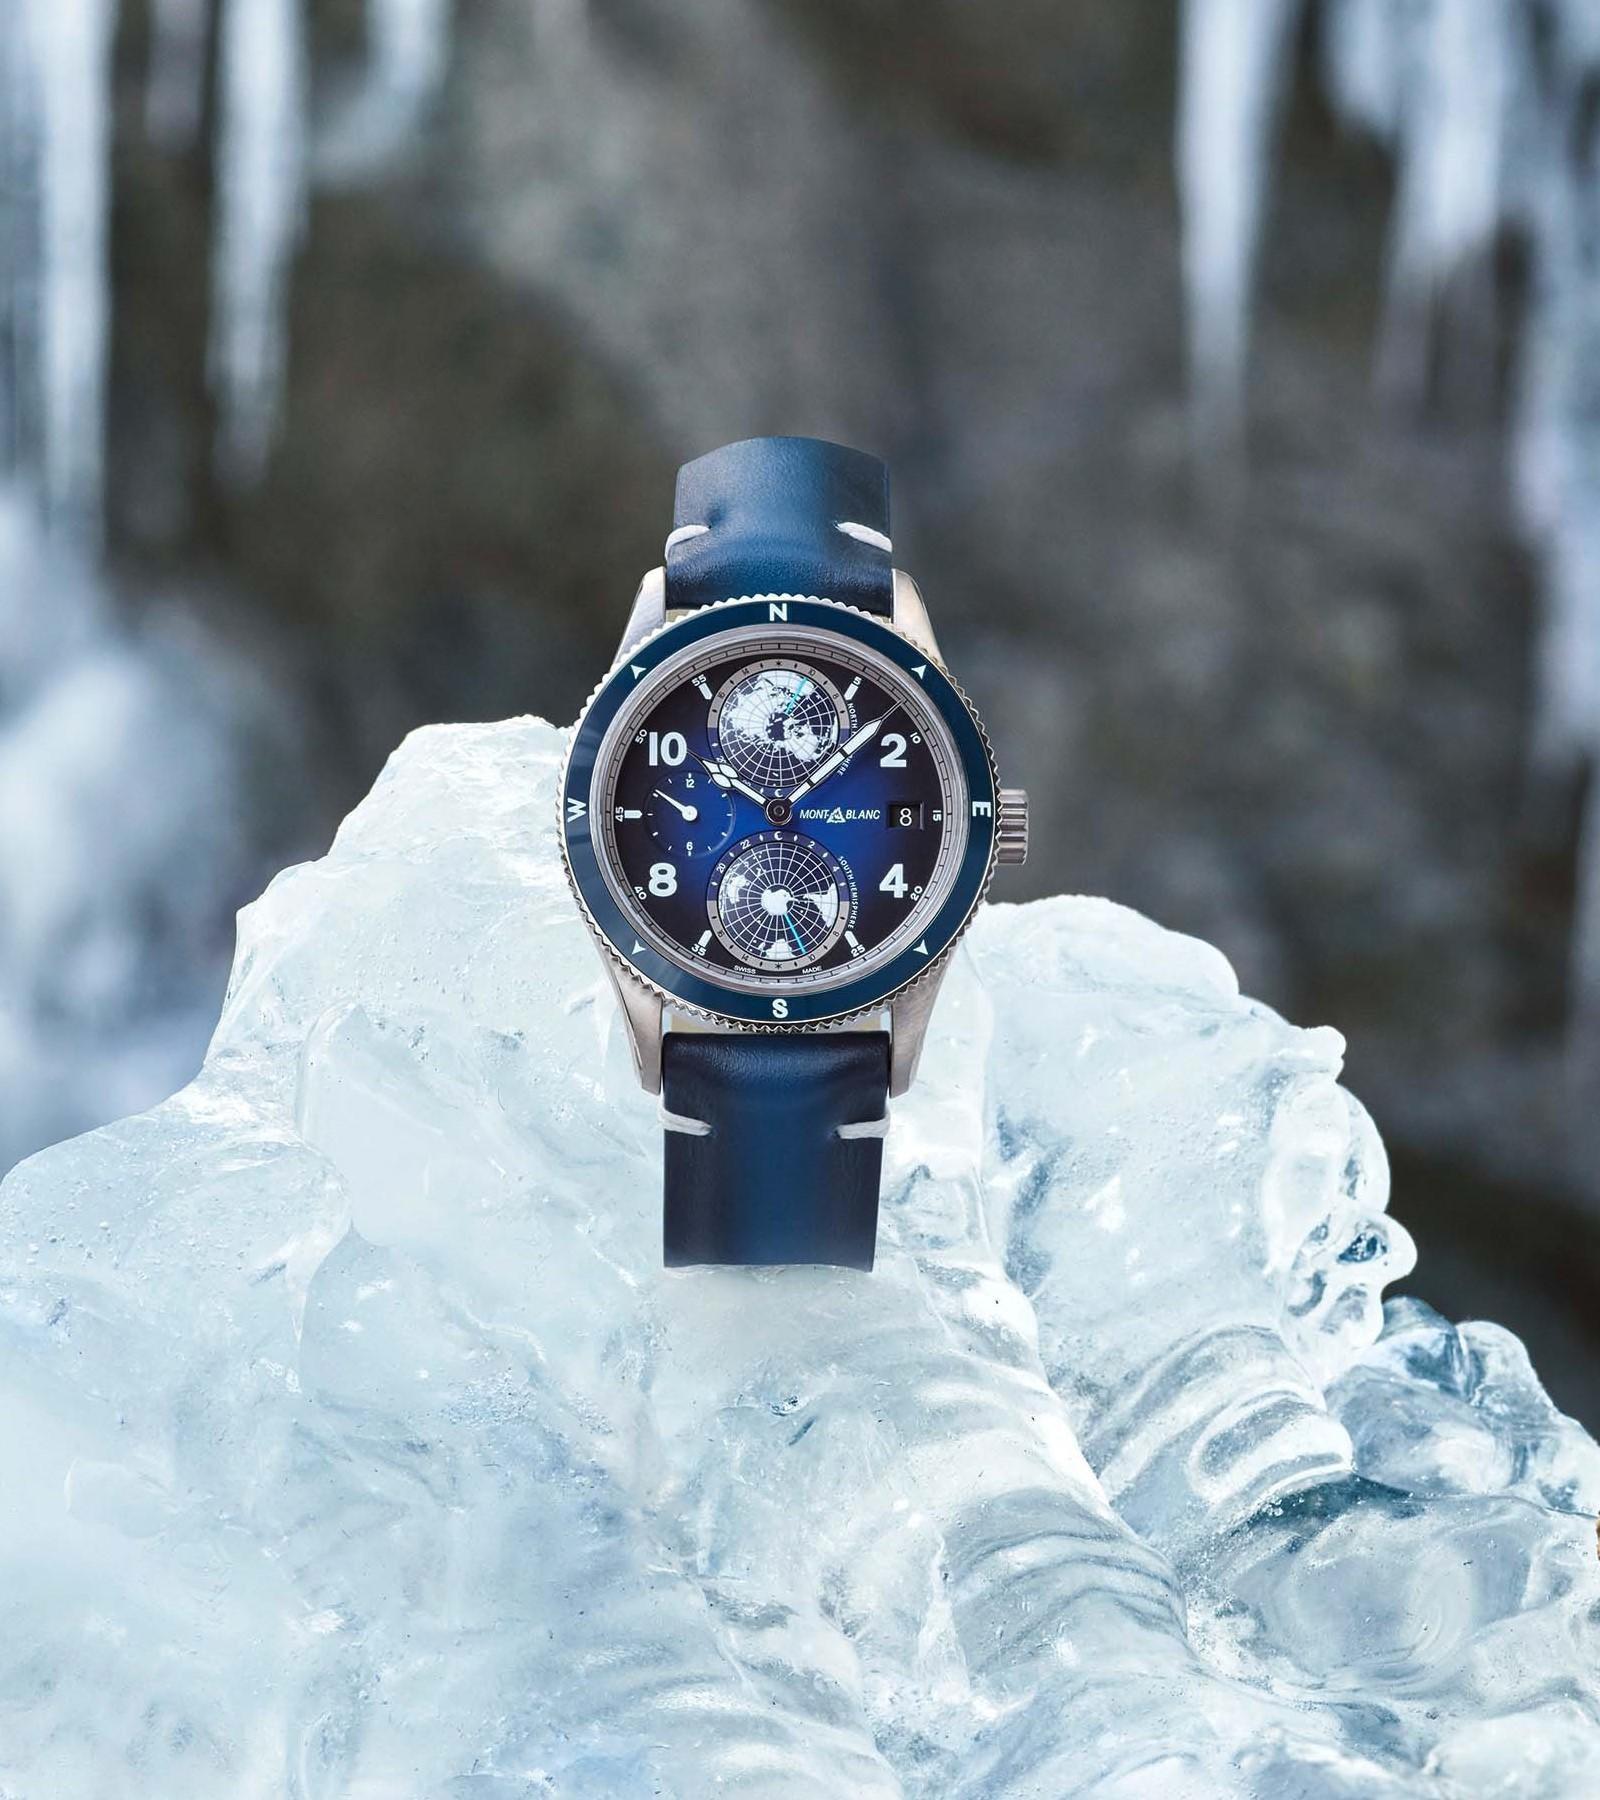 Geosphere on ice. (Montblanc/divulgação)